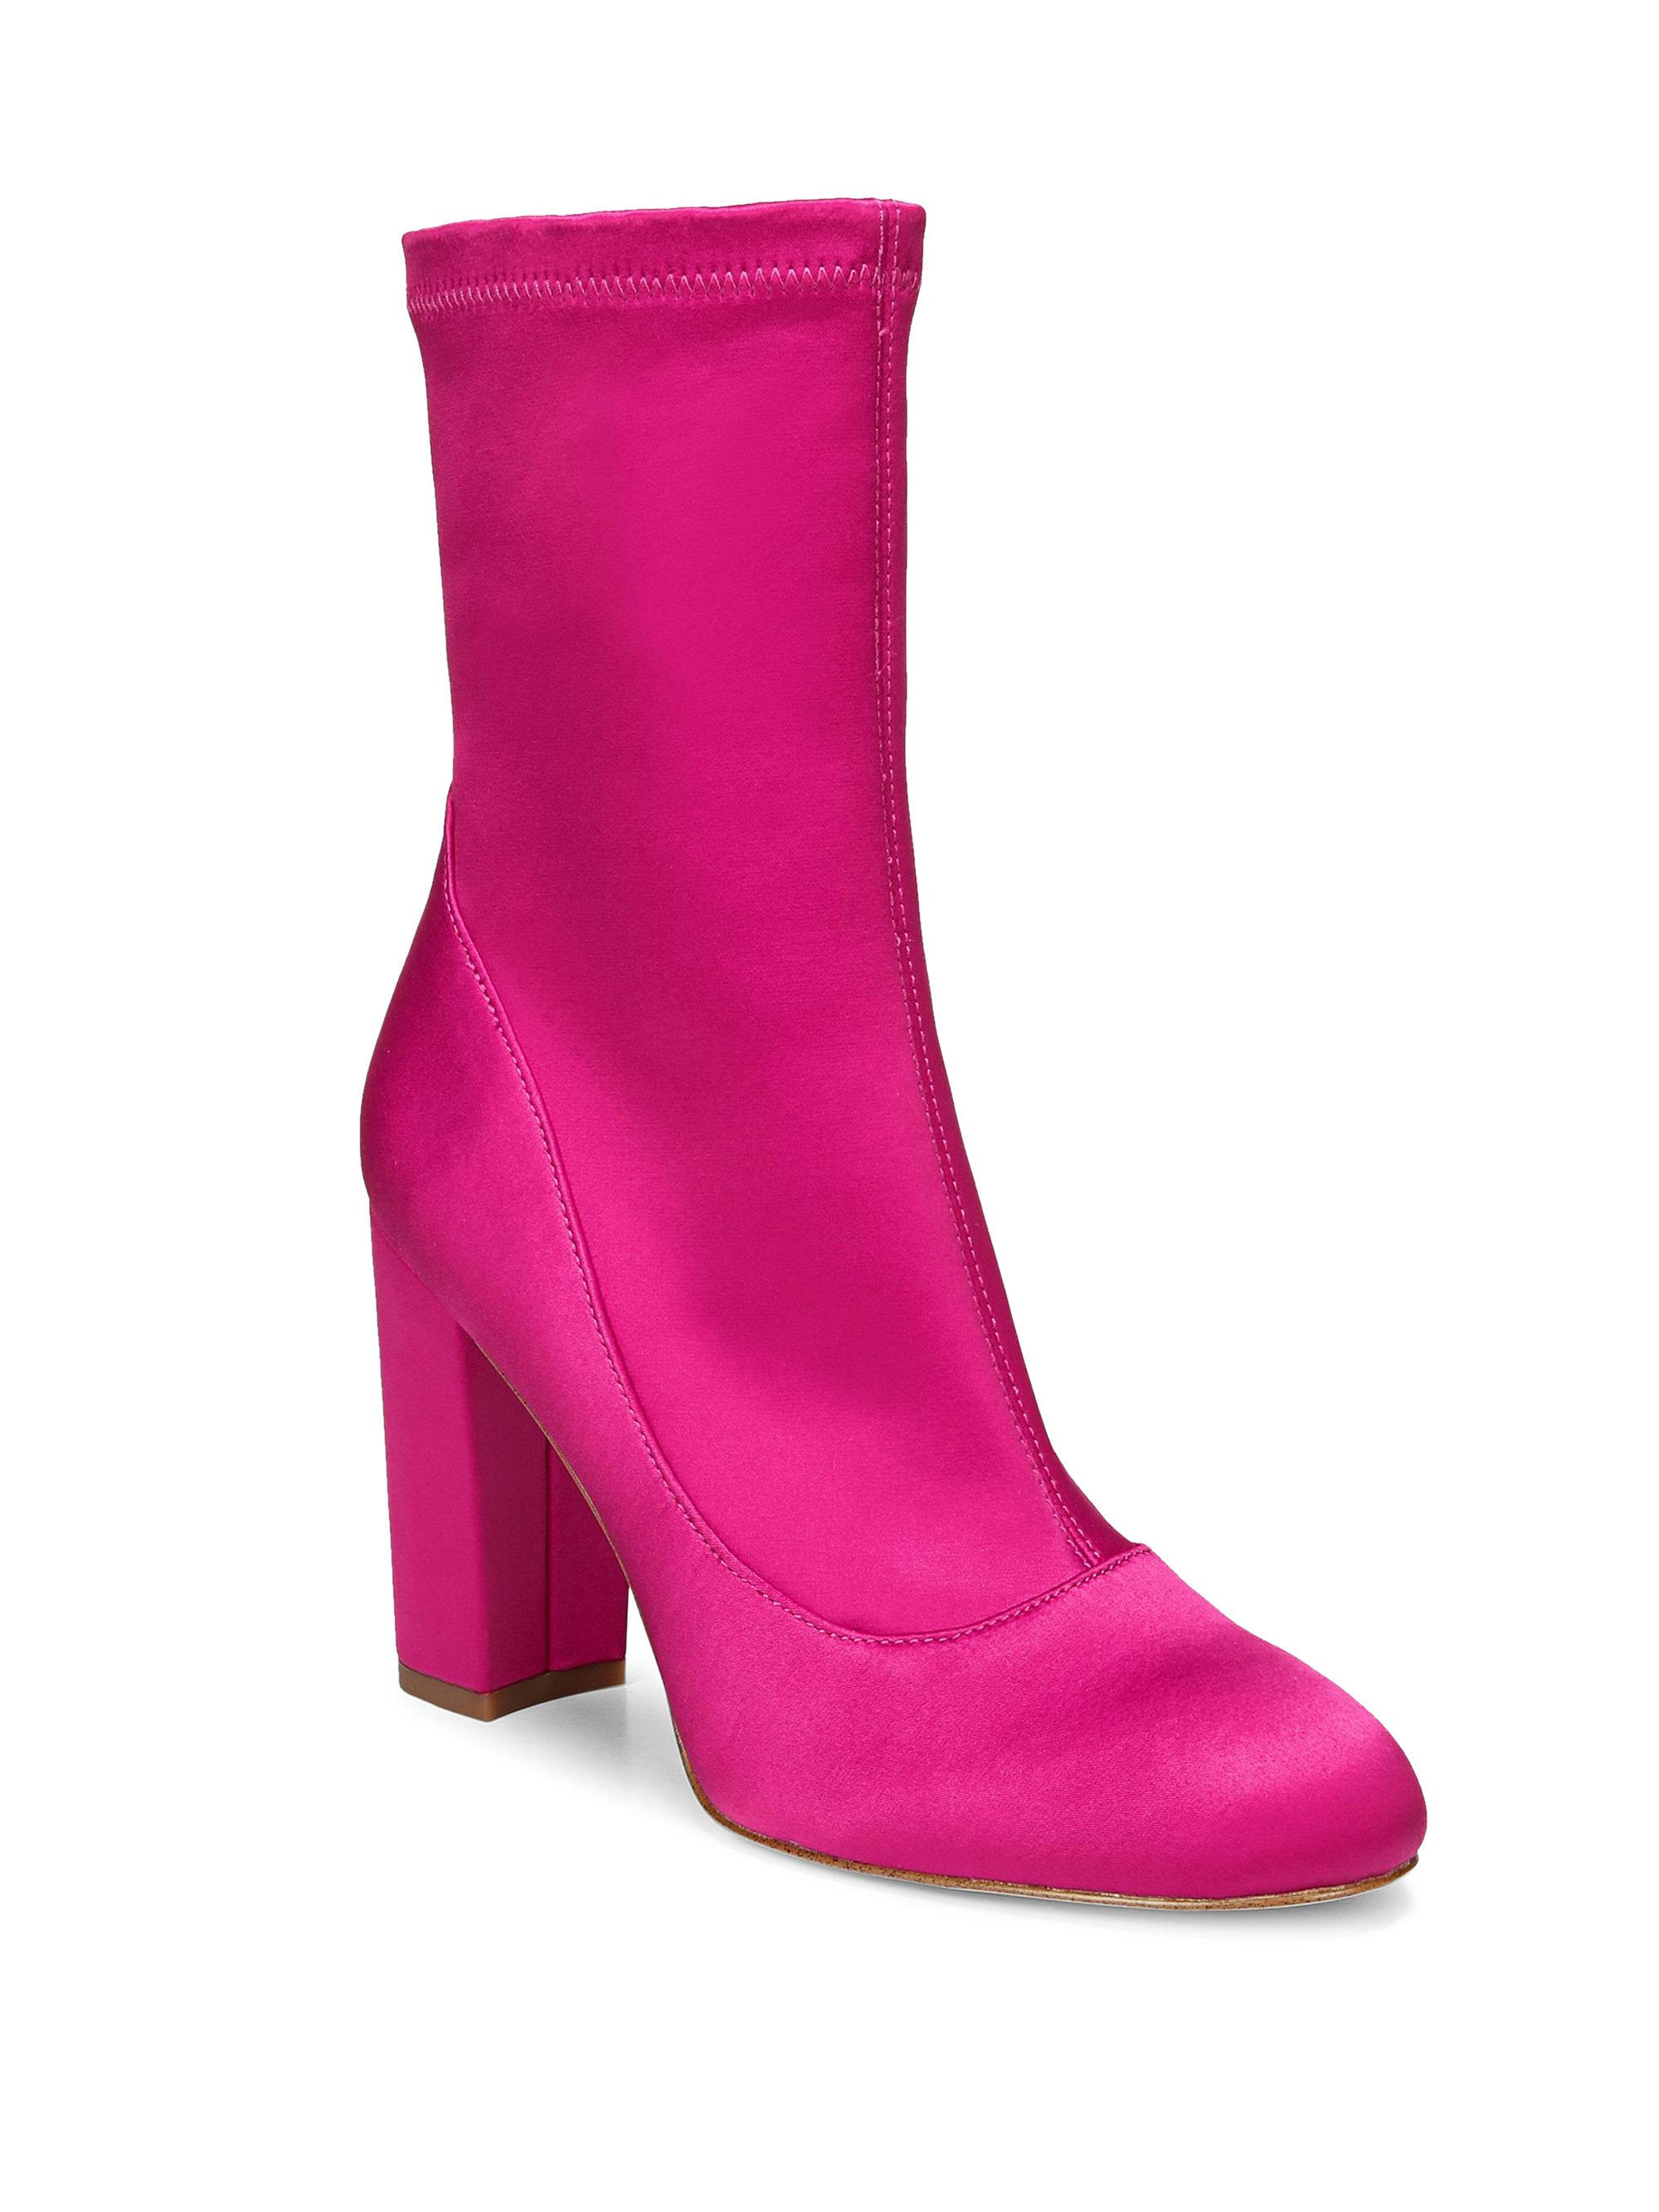 ab2f7635cc85b Lyst - Sam Edelman Satin Sock Booties in Pink